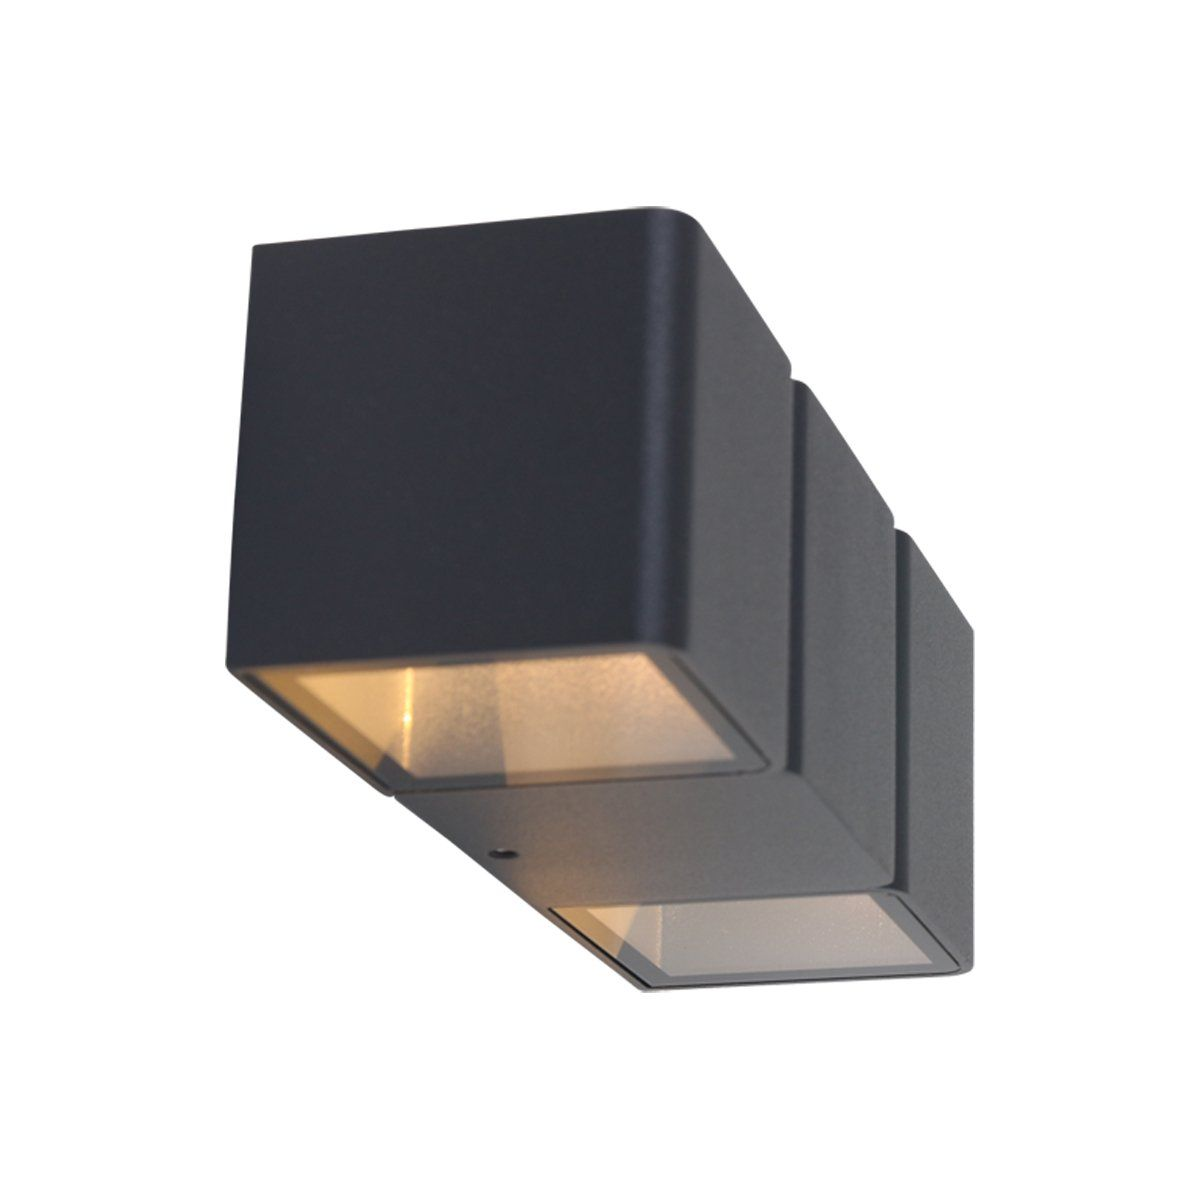 Steinhauer buiten wandlamp Jax 2 lichts - zwart